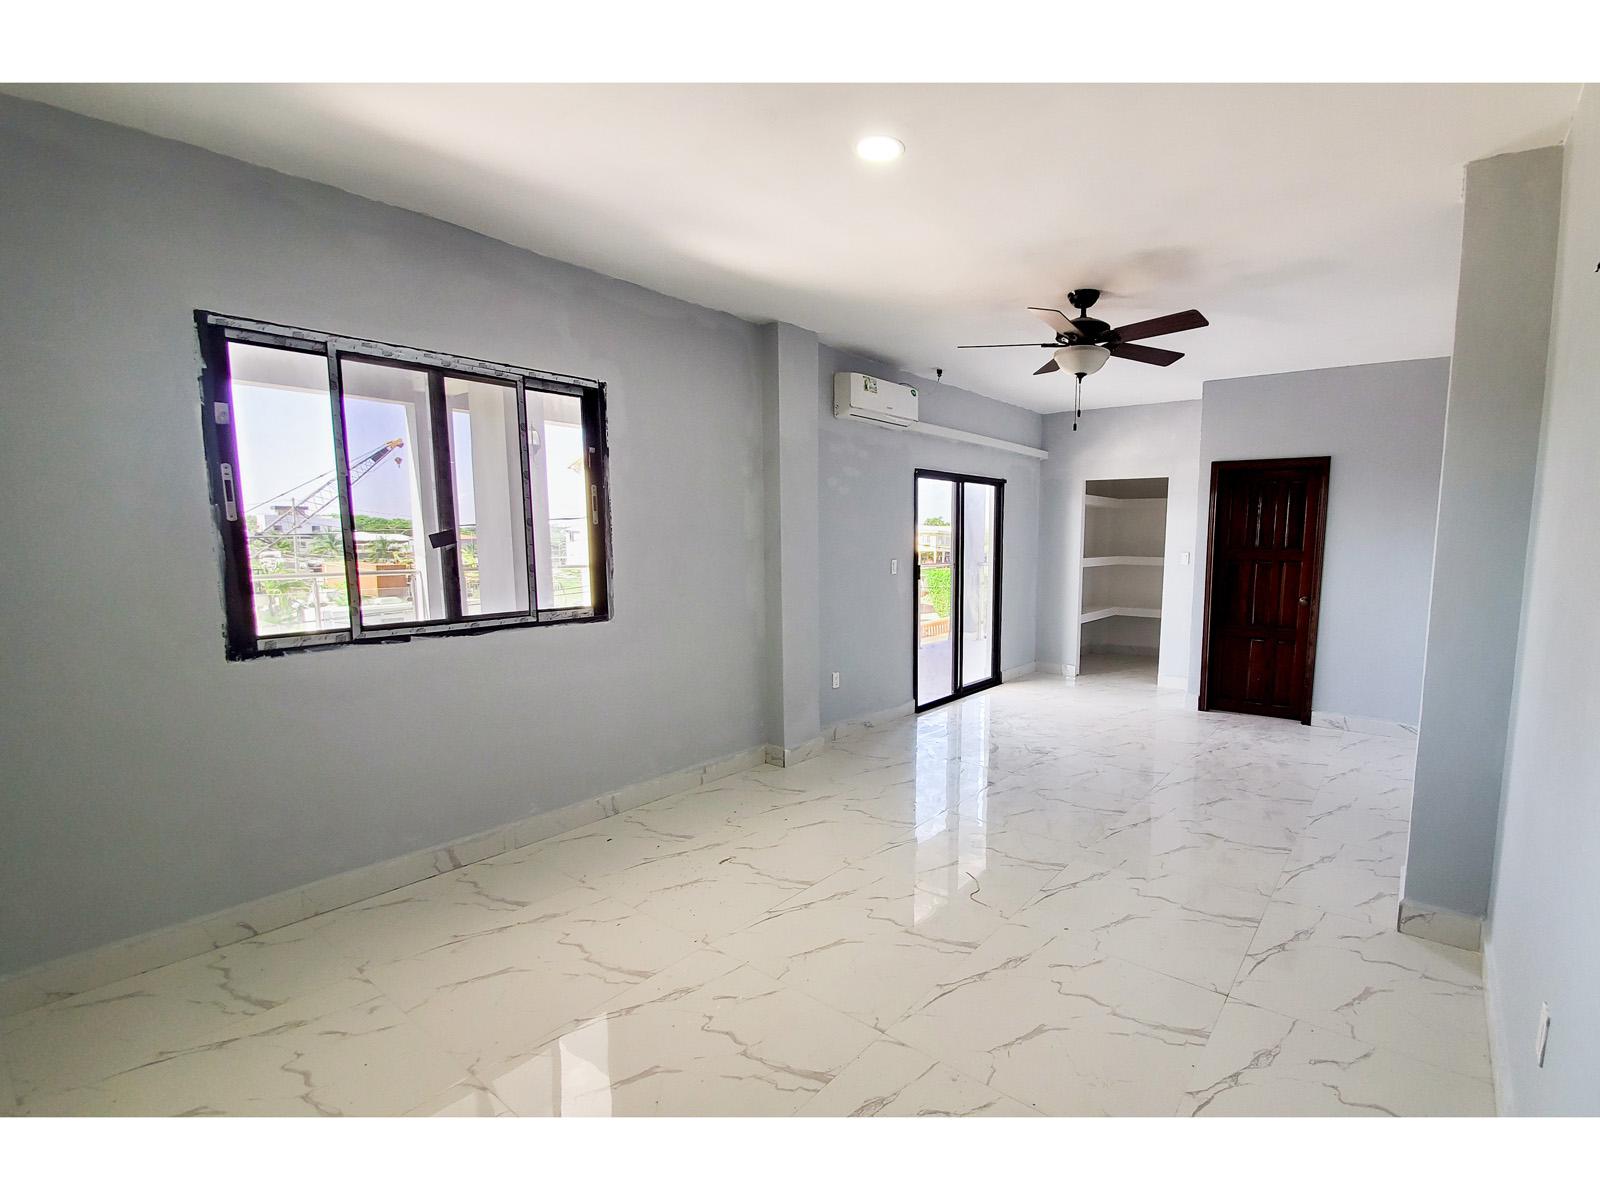 Modern 3 bedroom 2.5 bathroom apartment for Rent in Belize City